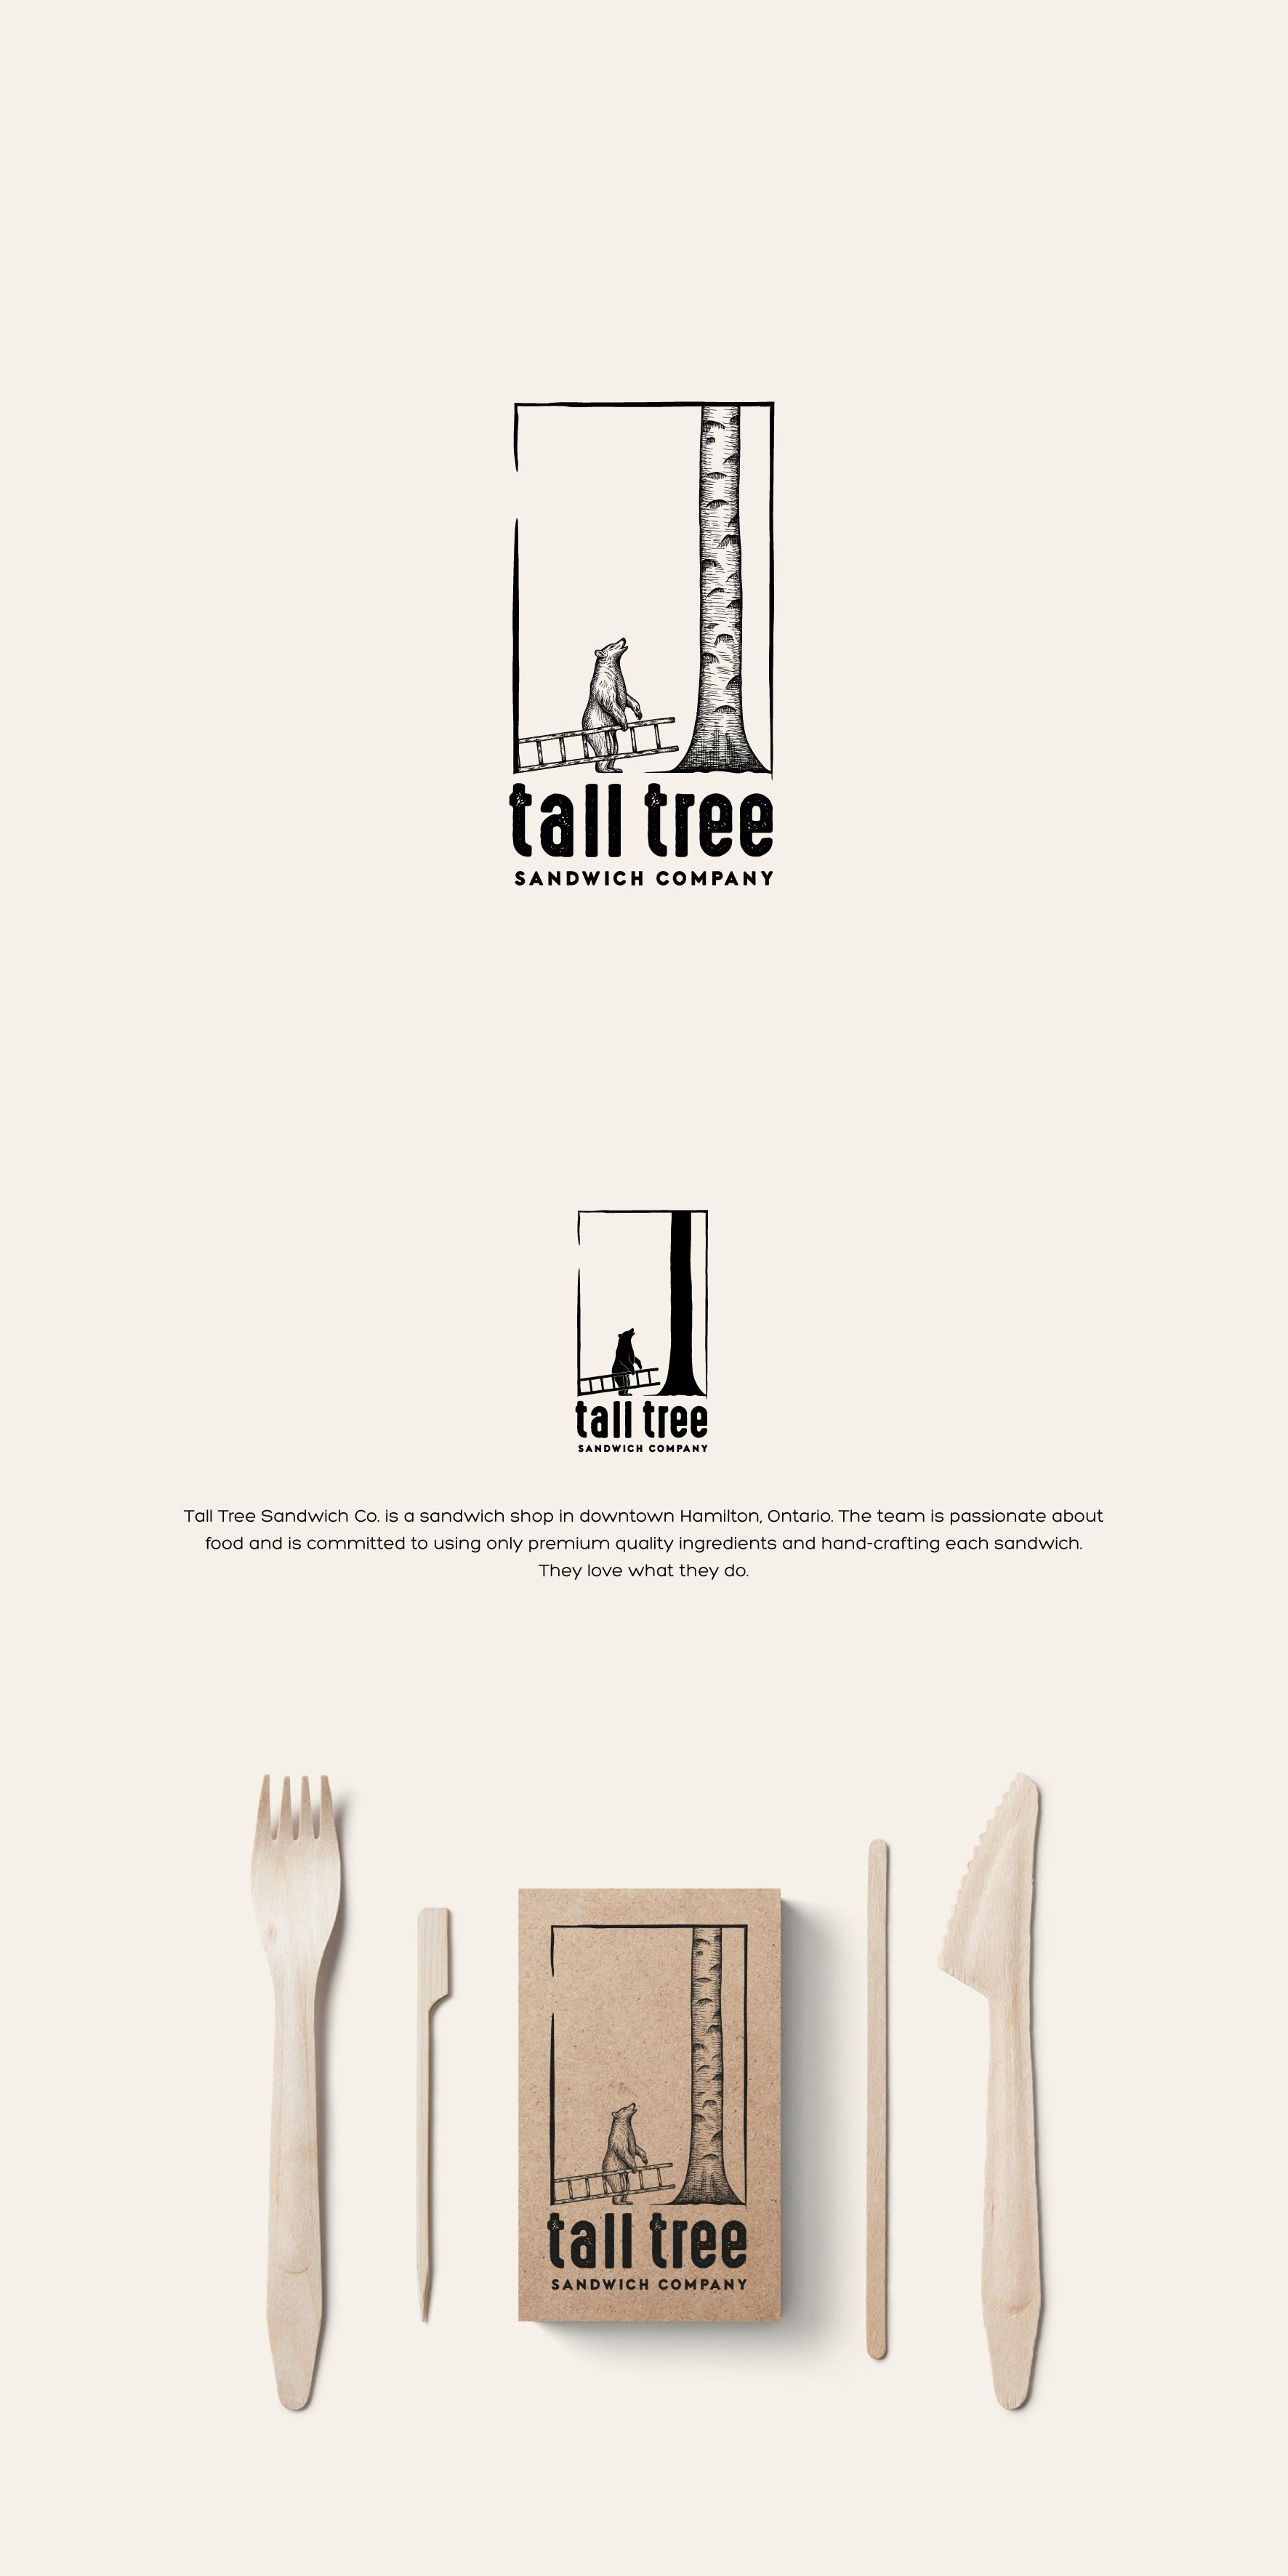 Tall Tree Sandwich Company